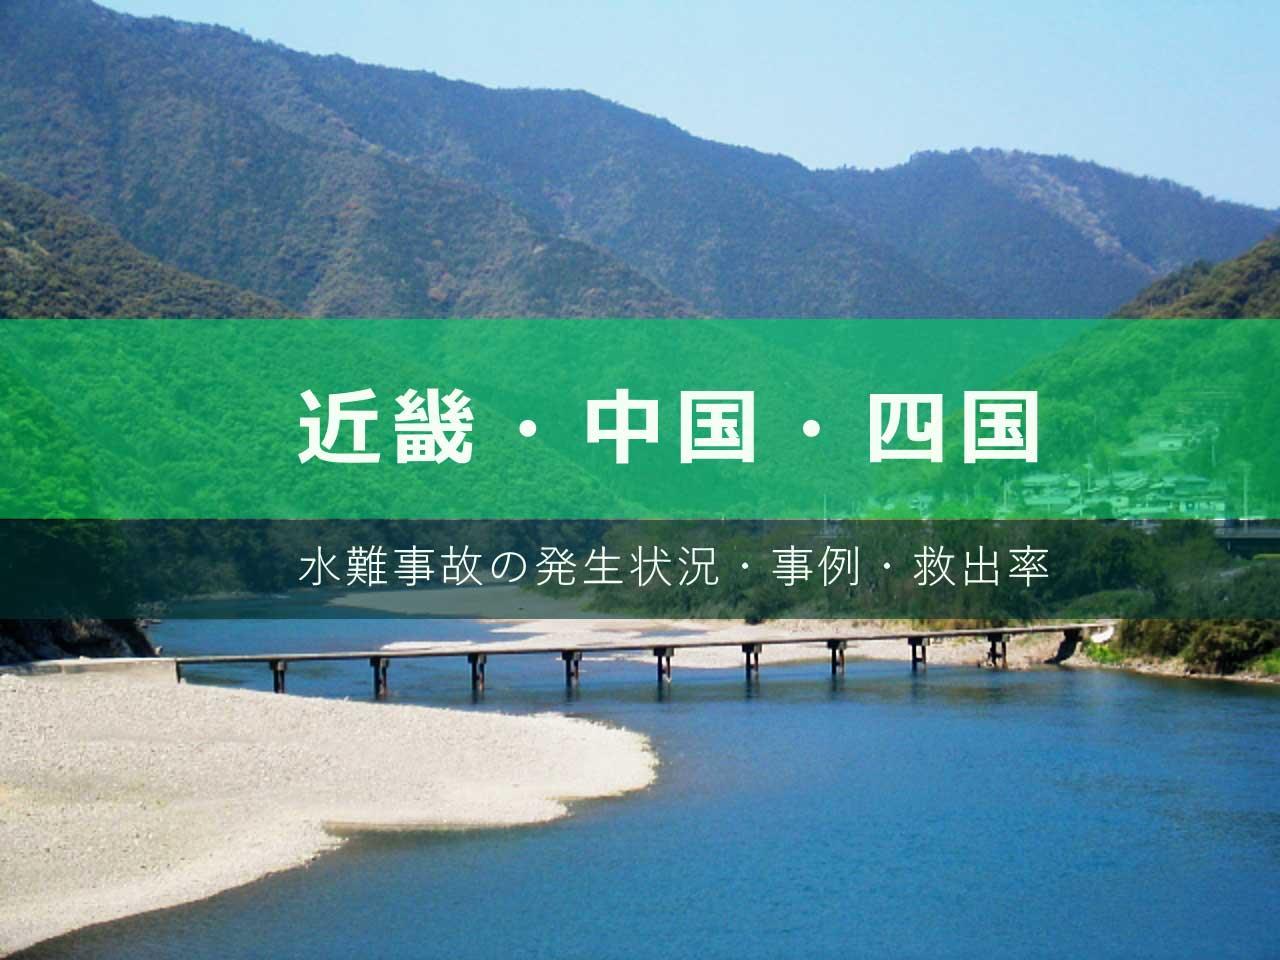 近畿・中国・四国の水難事故